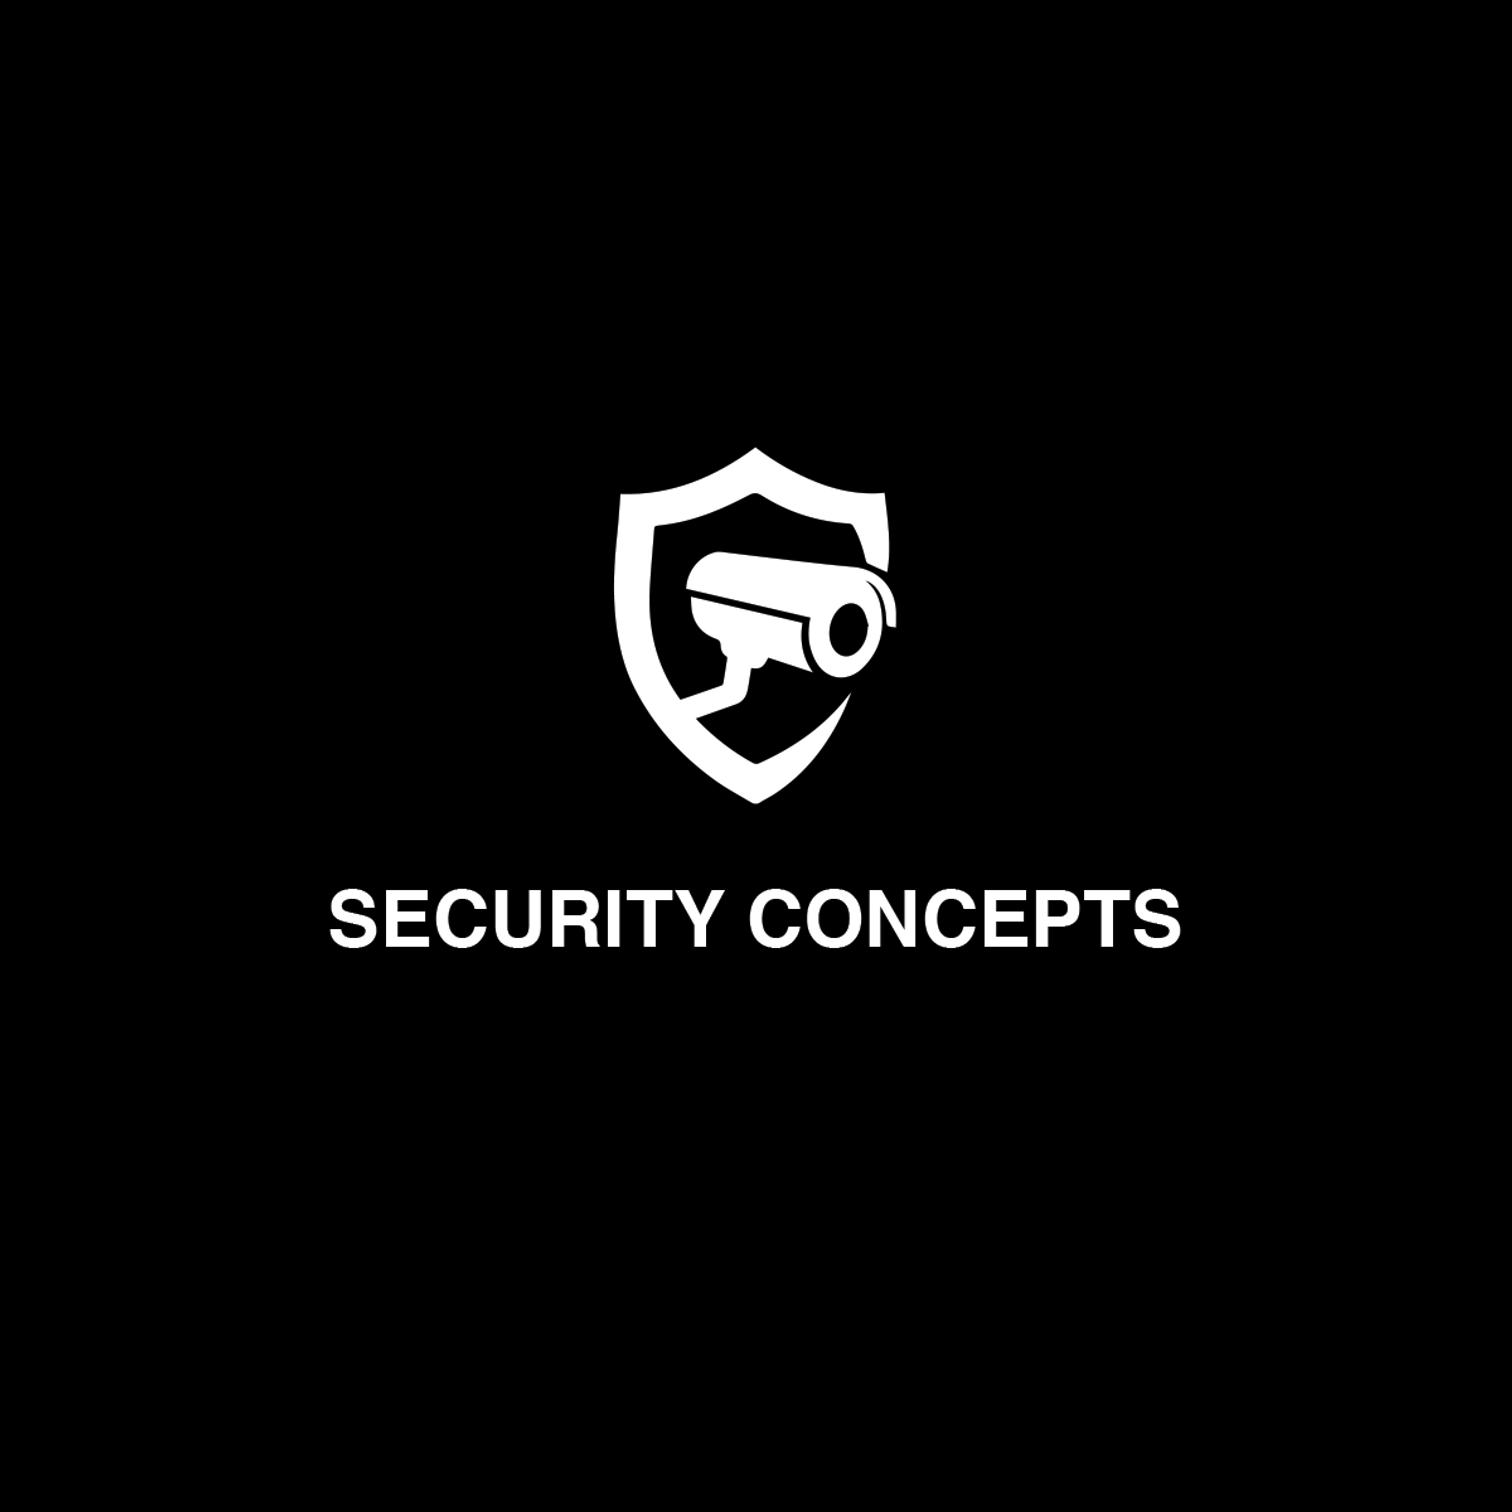 Security Concepts logo